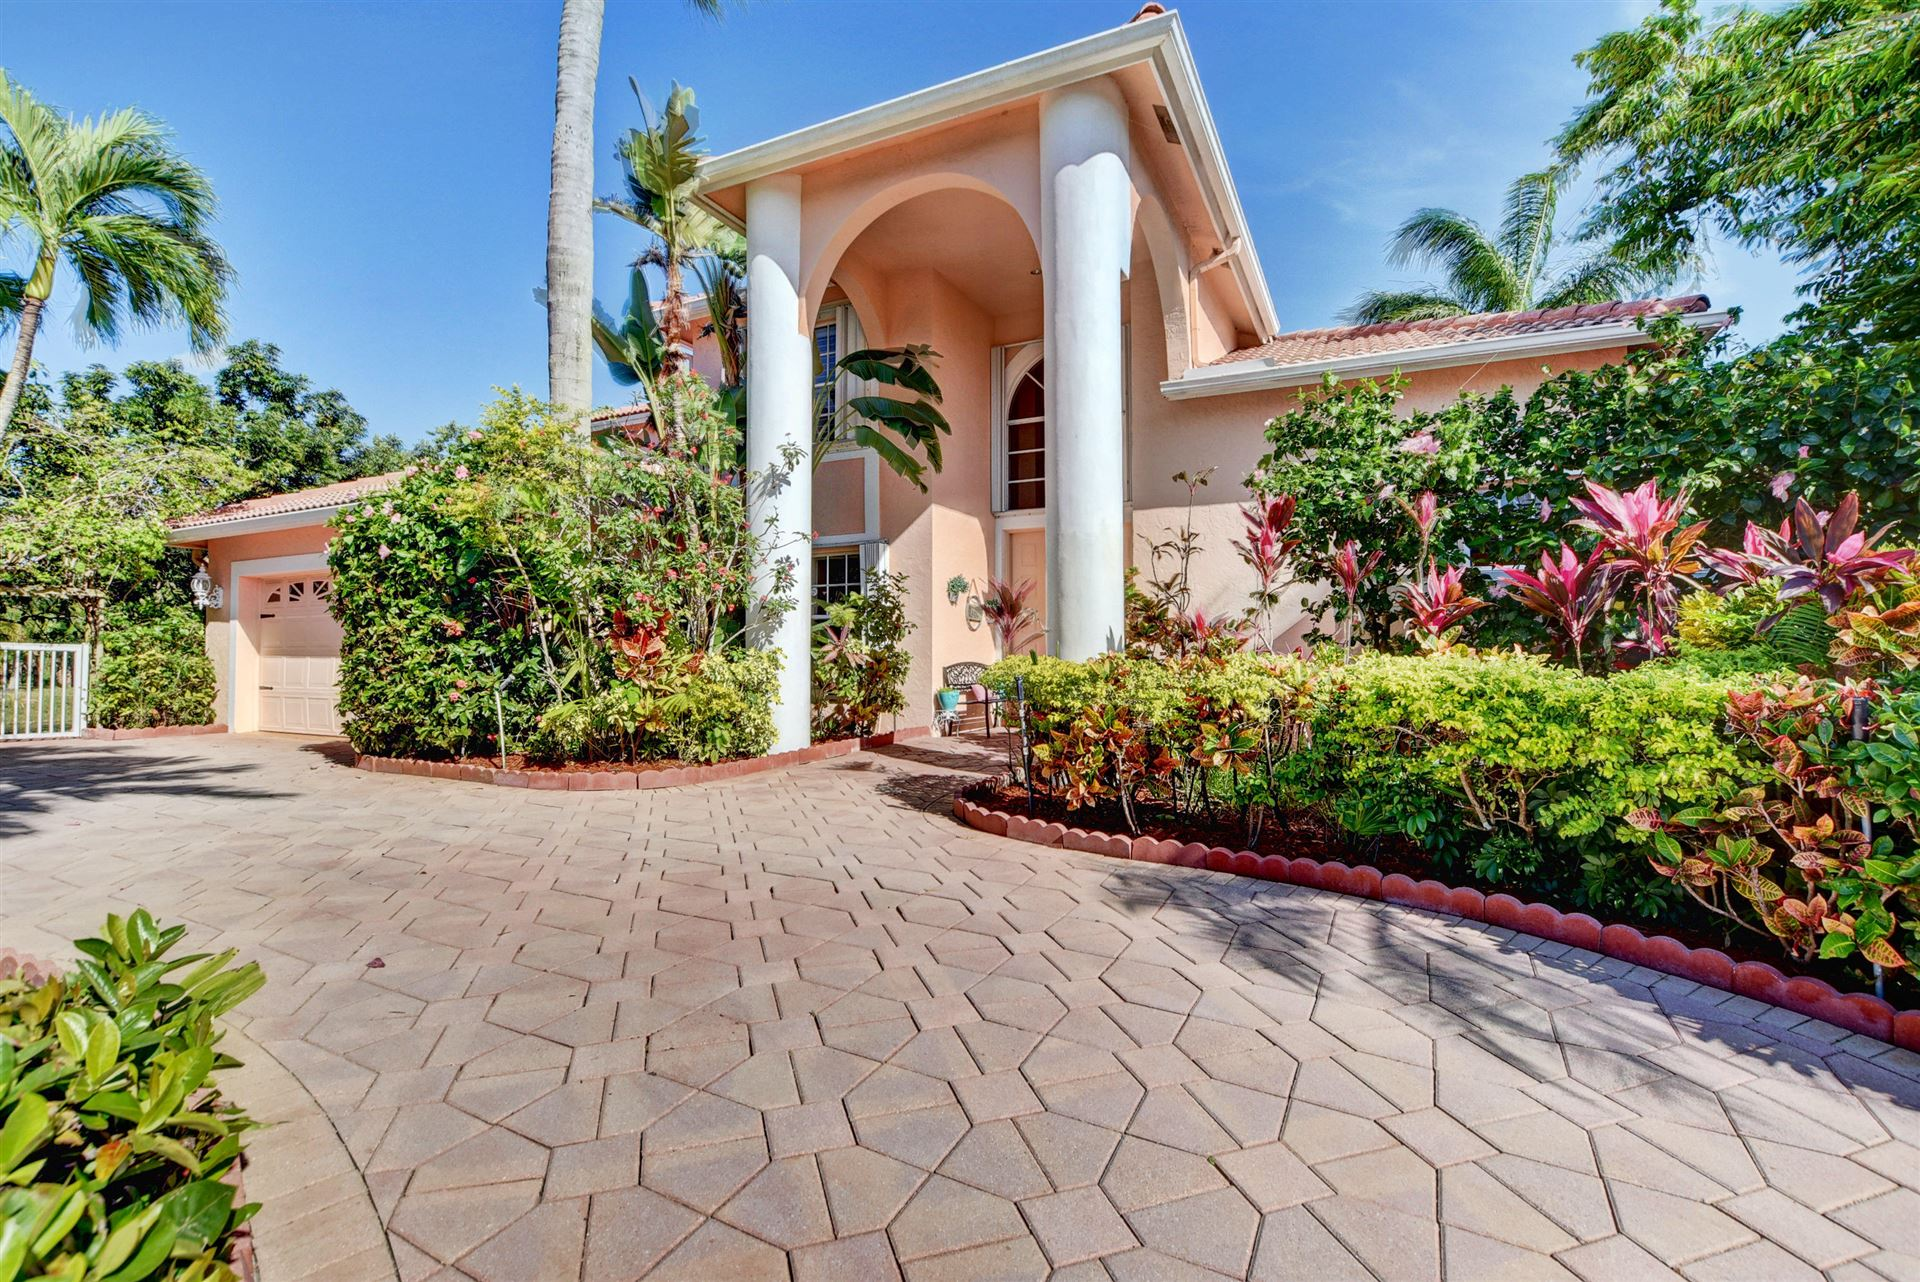 9342 Aqua Vista Boulevard, Boynton Beach, FL 33437 - #: RX-10694745